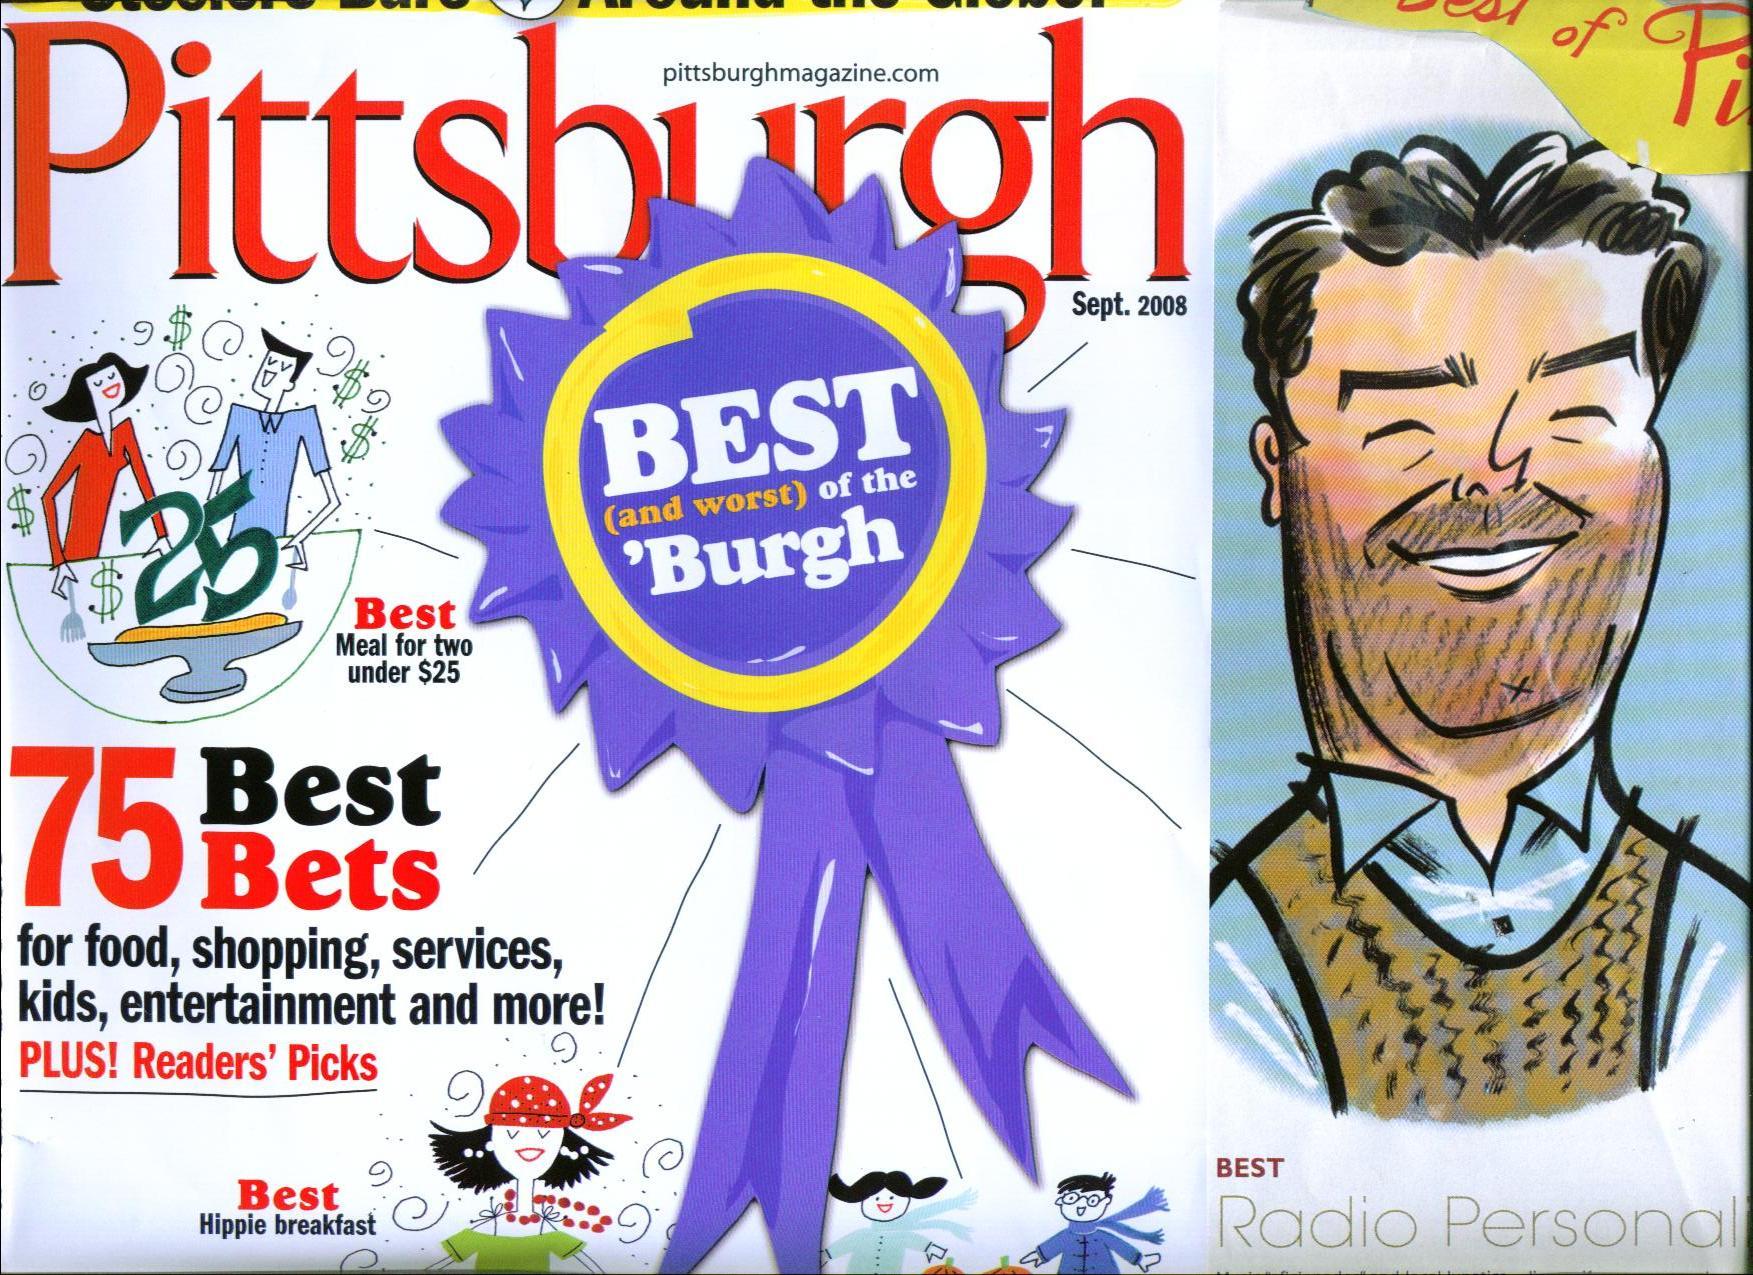 Jimmy Krenn, Pittsburgh Personality